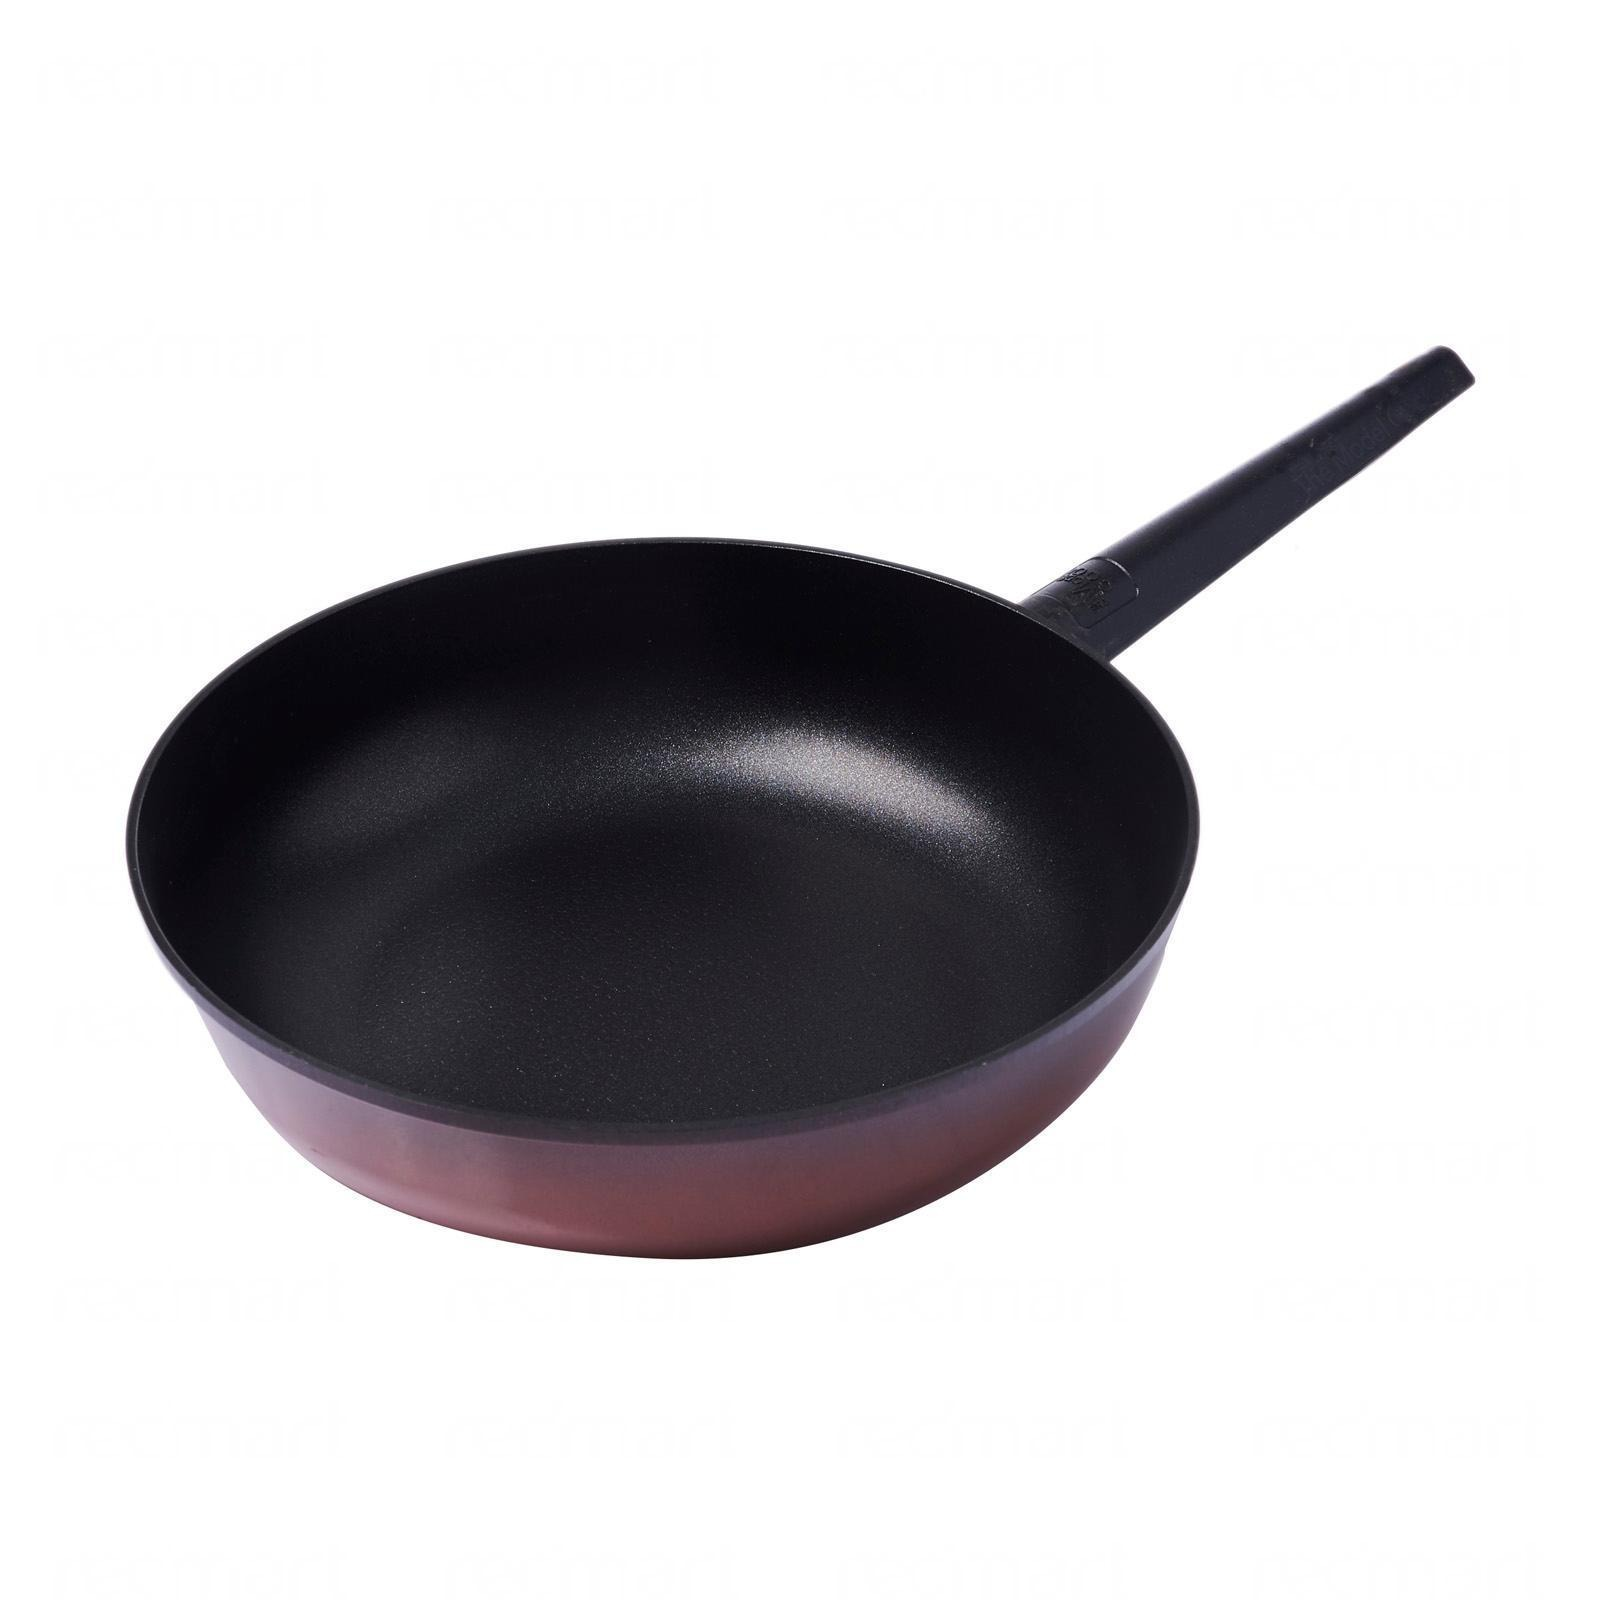 Queensense Non Stick Zicronium Frying Pan Round